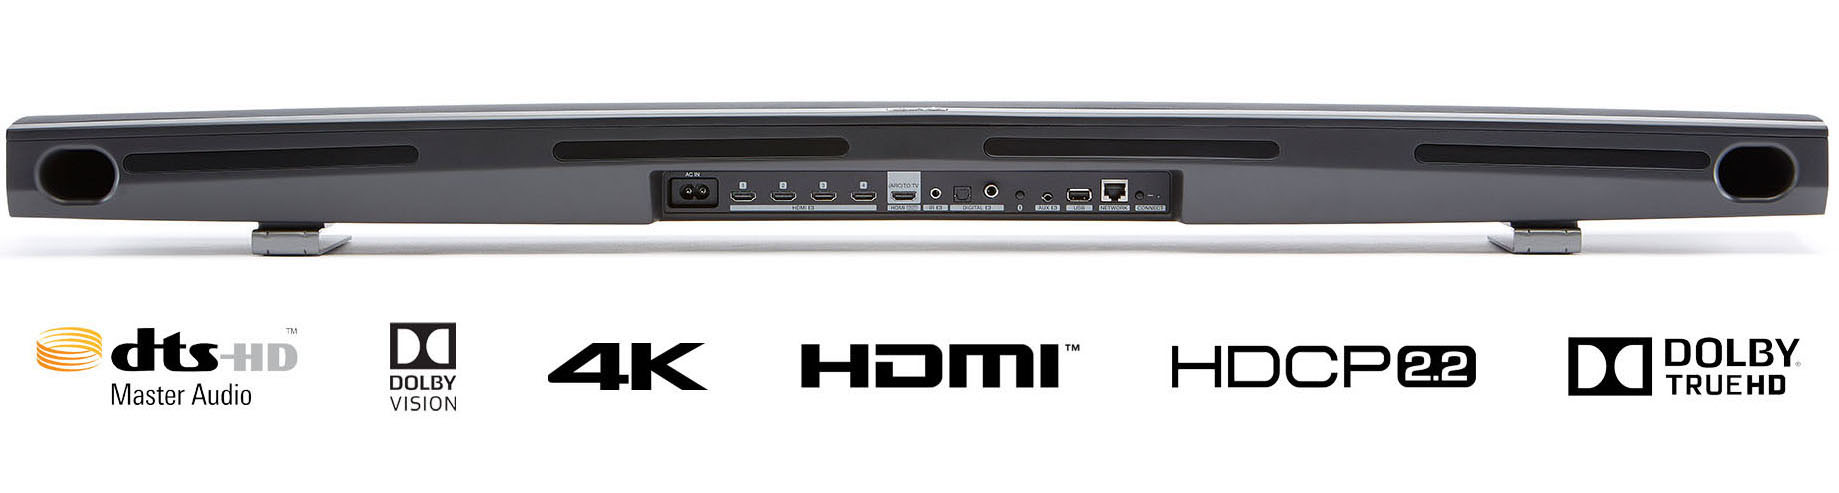 design Denon DHT-S716H